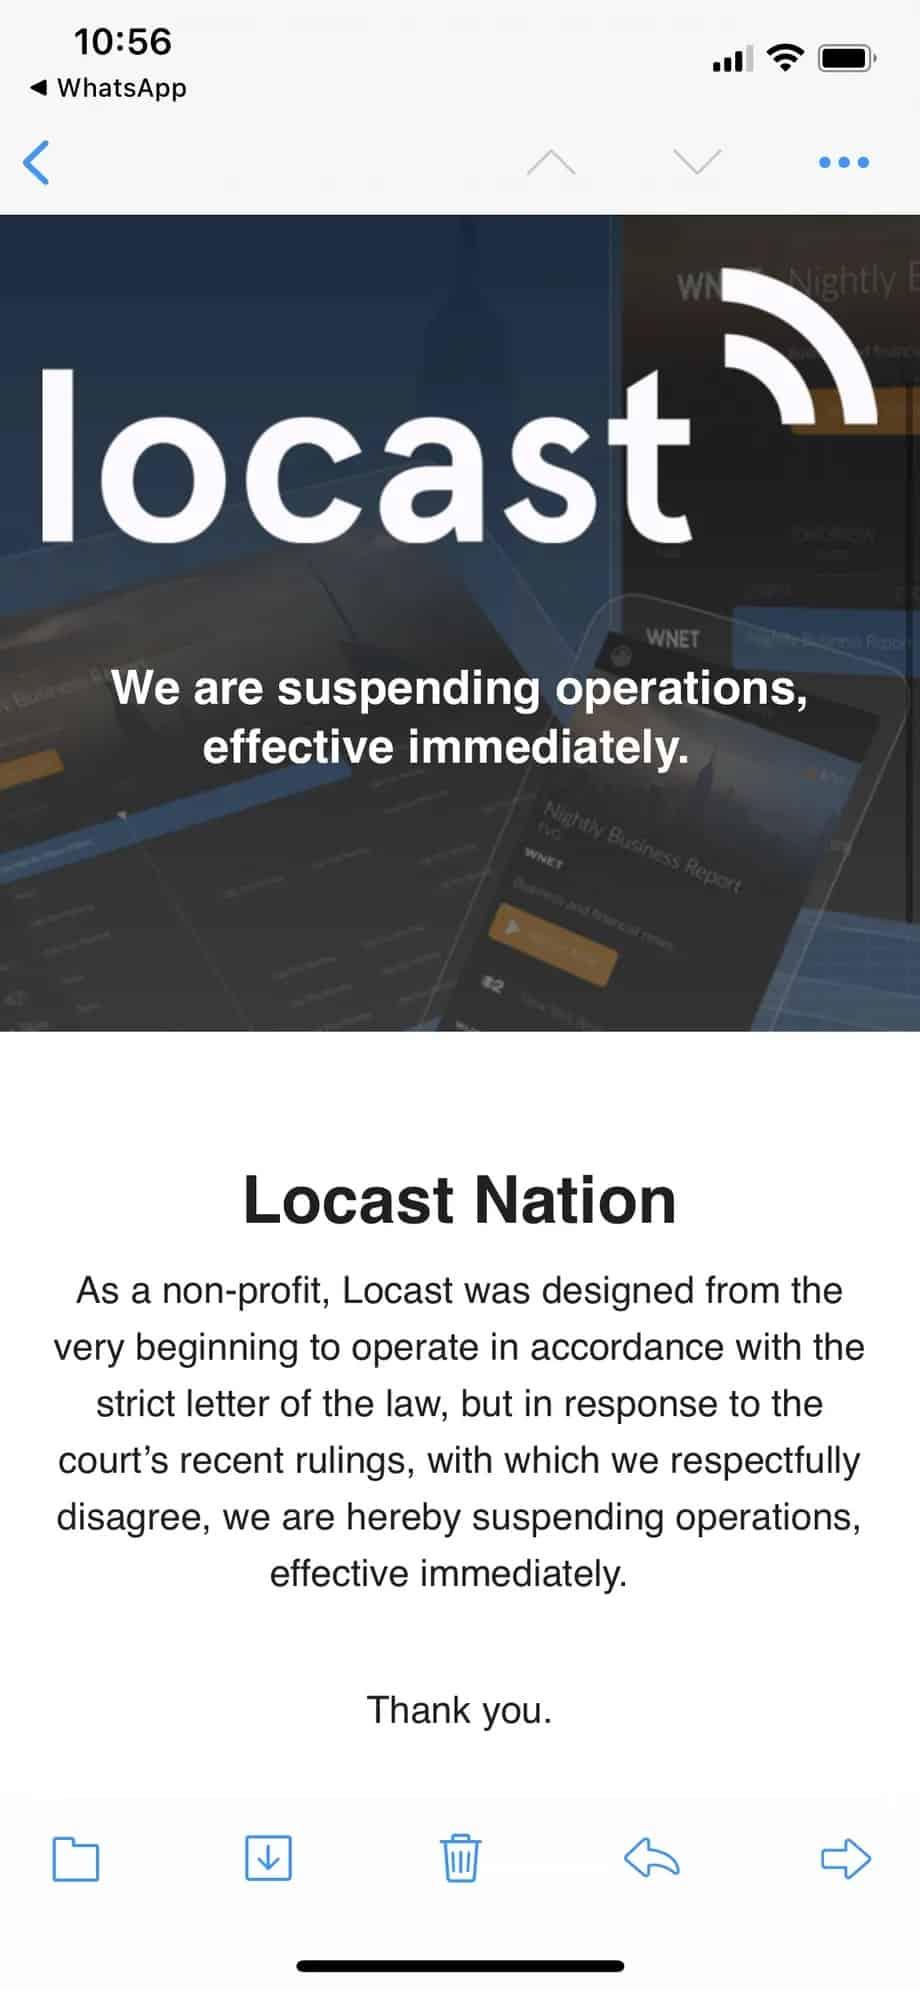 Locast streaming service suspend operation